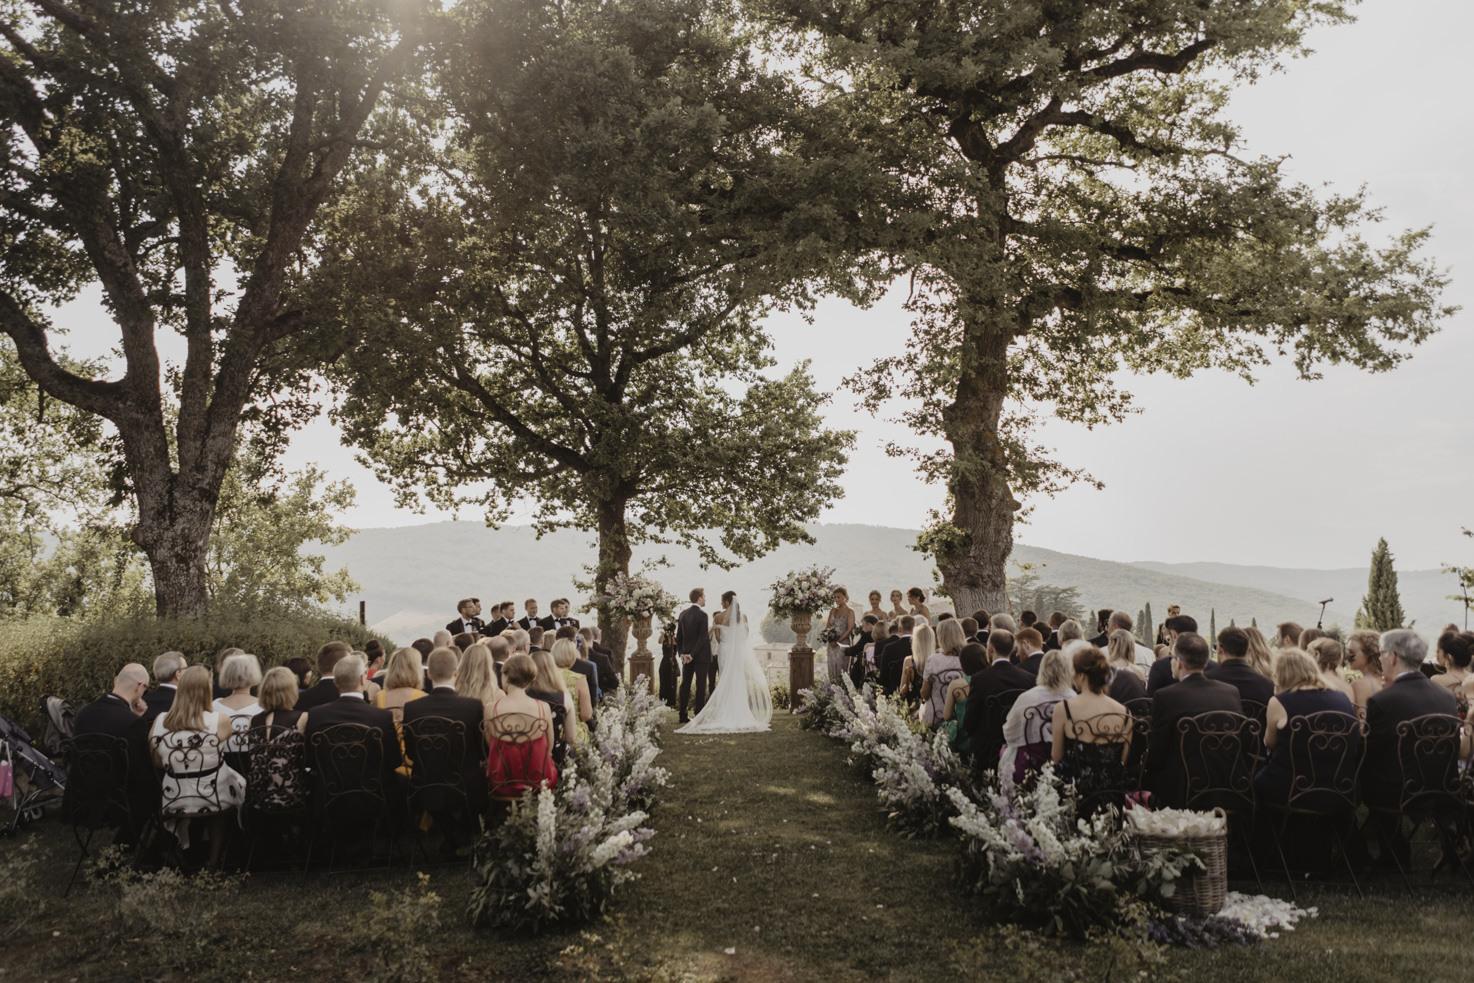 Wedding ceremony in the castle gardens